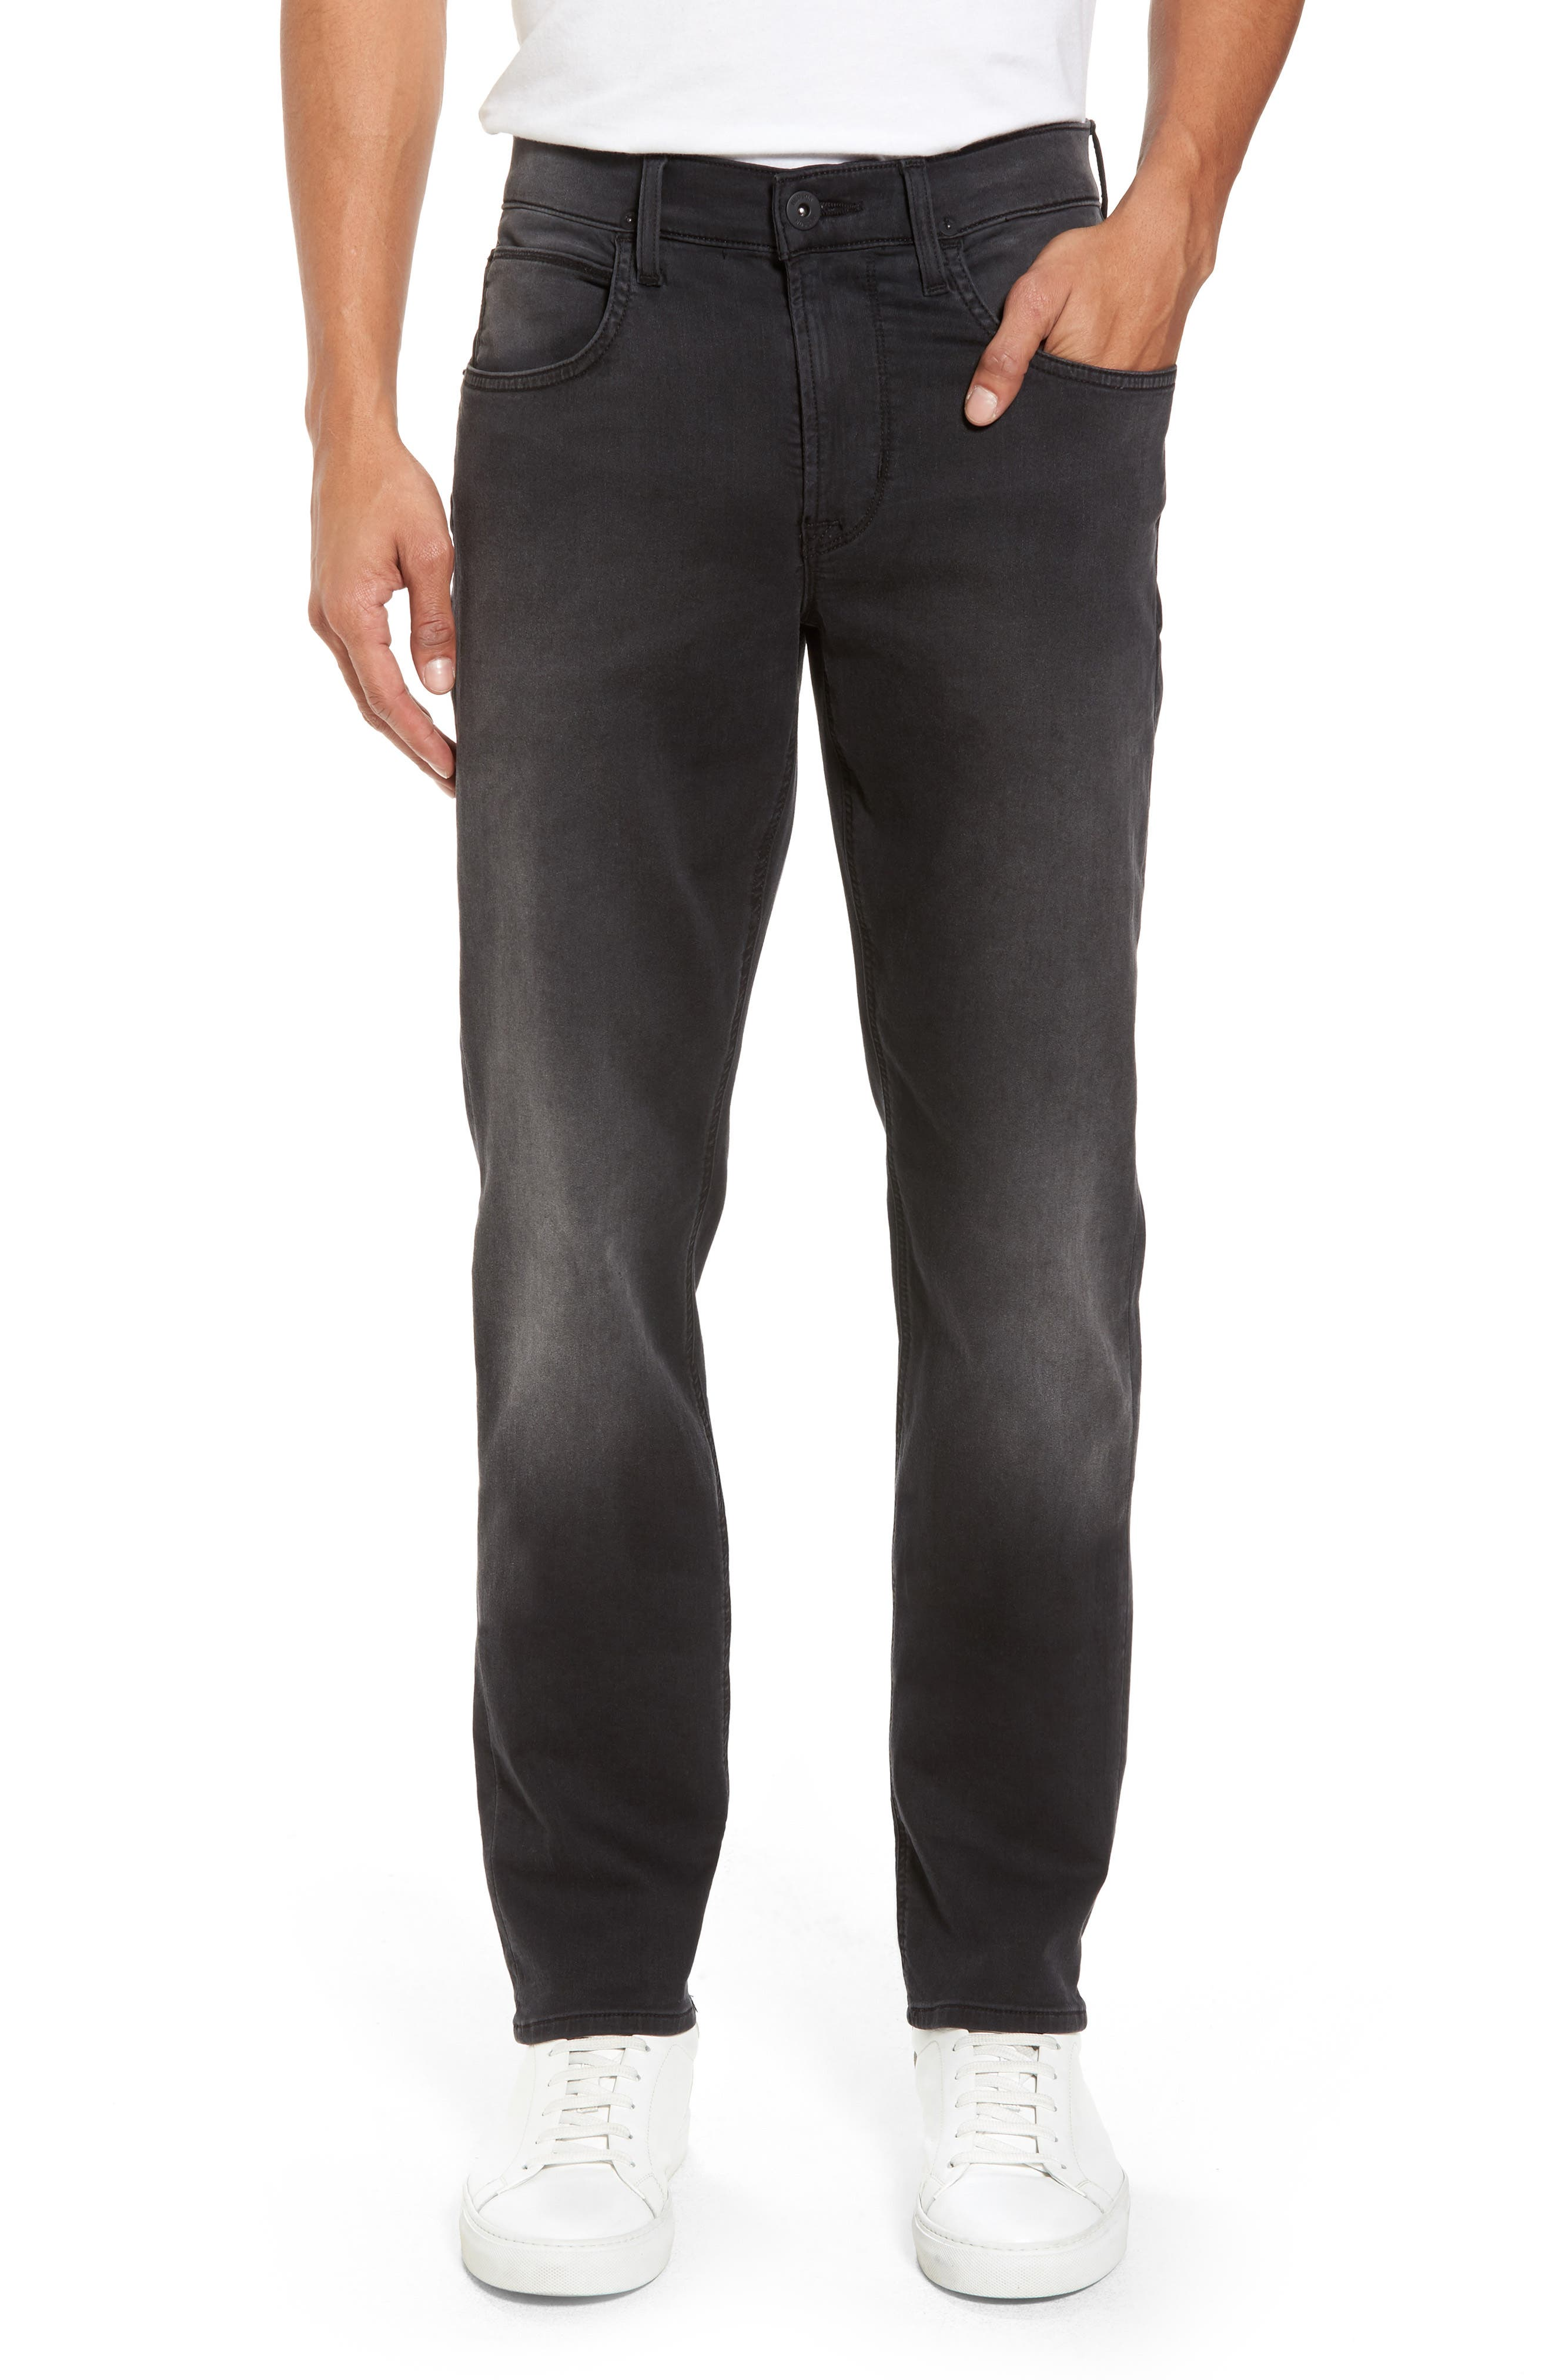 Alternate Image 1 Selected - Hudson Jeans Blake Slim Fit Jeans (Manual)